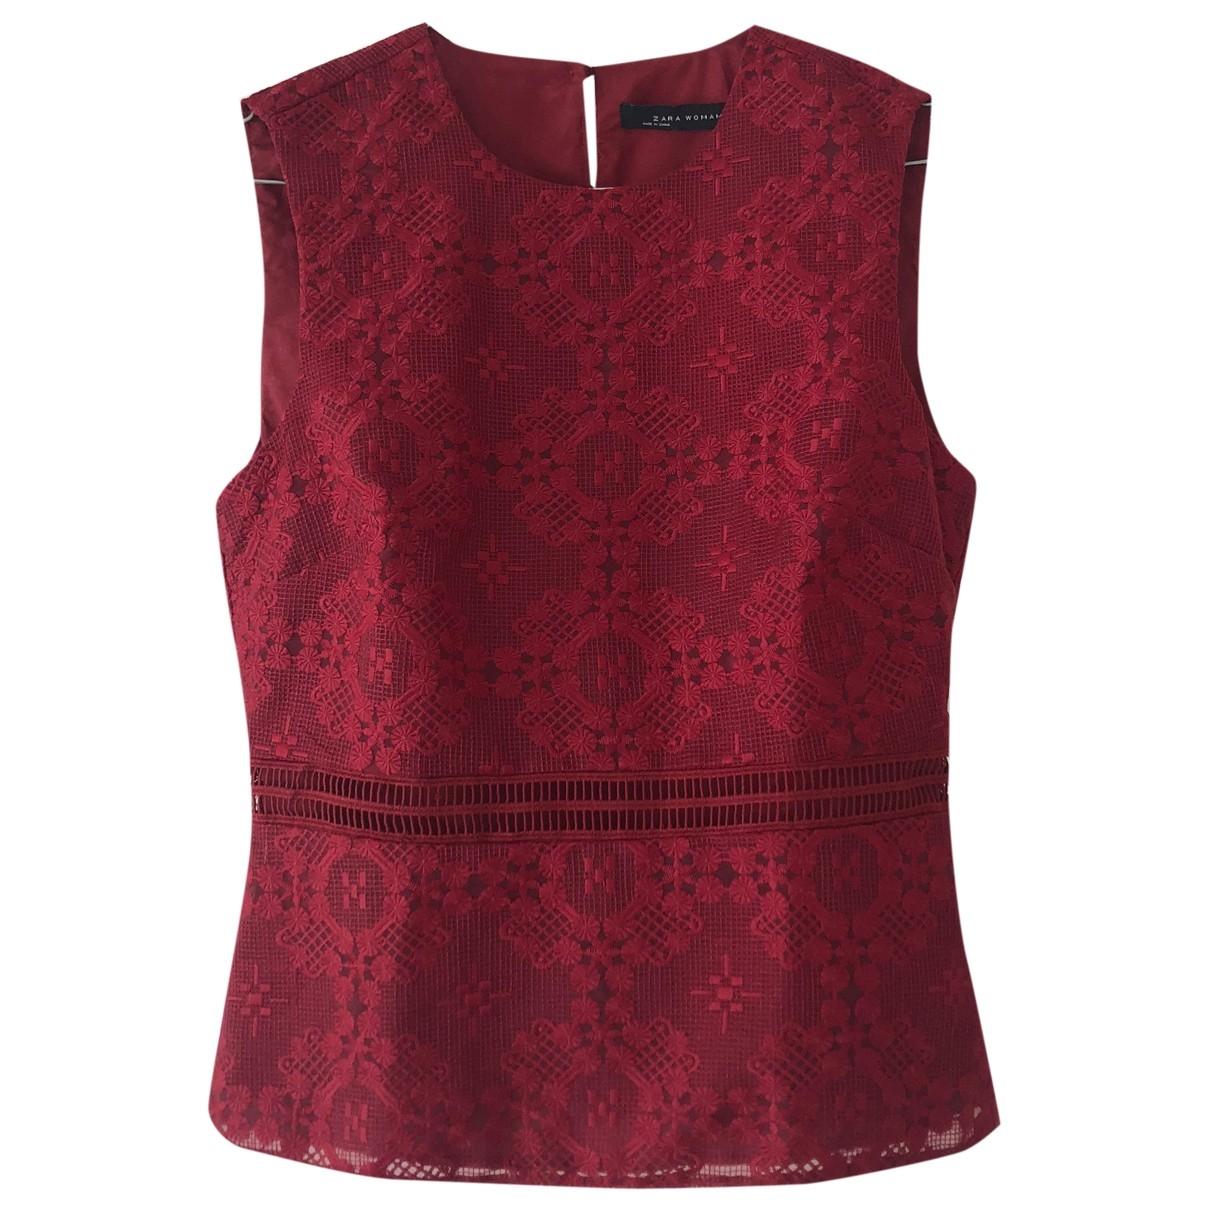 Zara \N Red Lace  top for Women S International